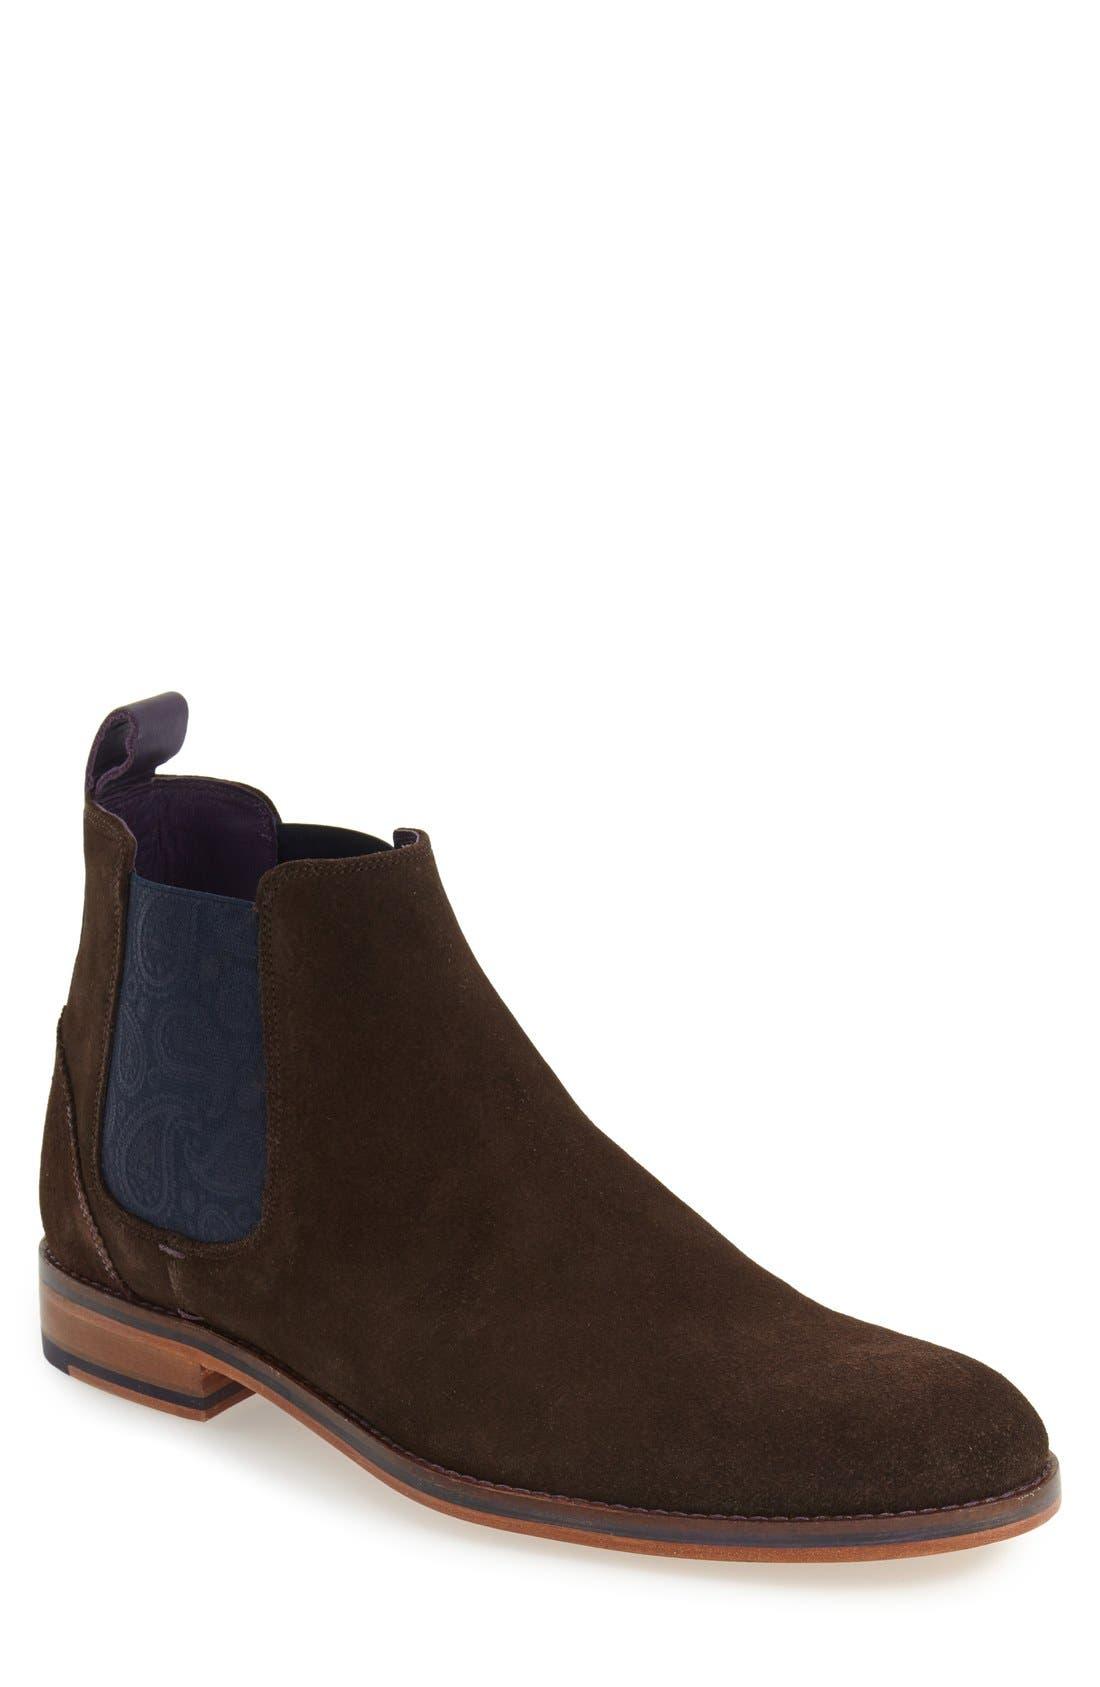 Alternate Image 1 Selected - Ted Baker London 'Camroon 4' Chelsea Boot (Men)